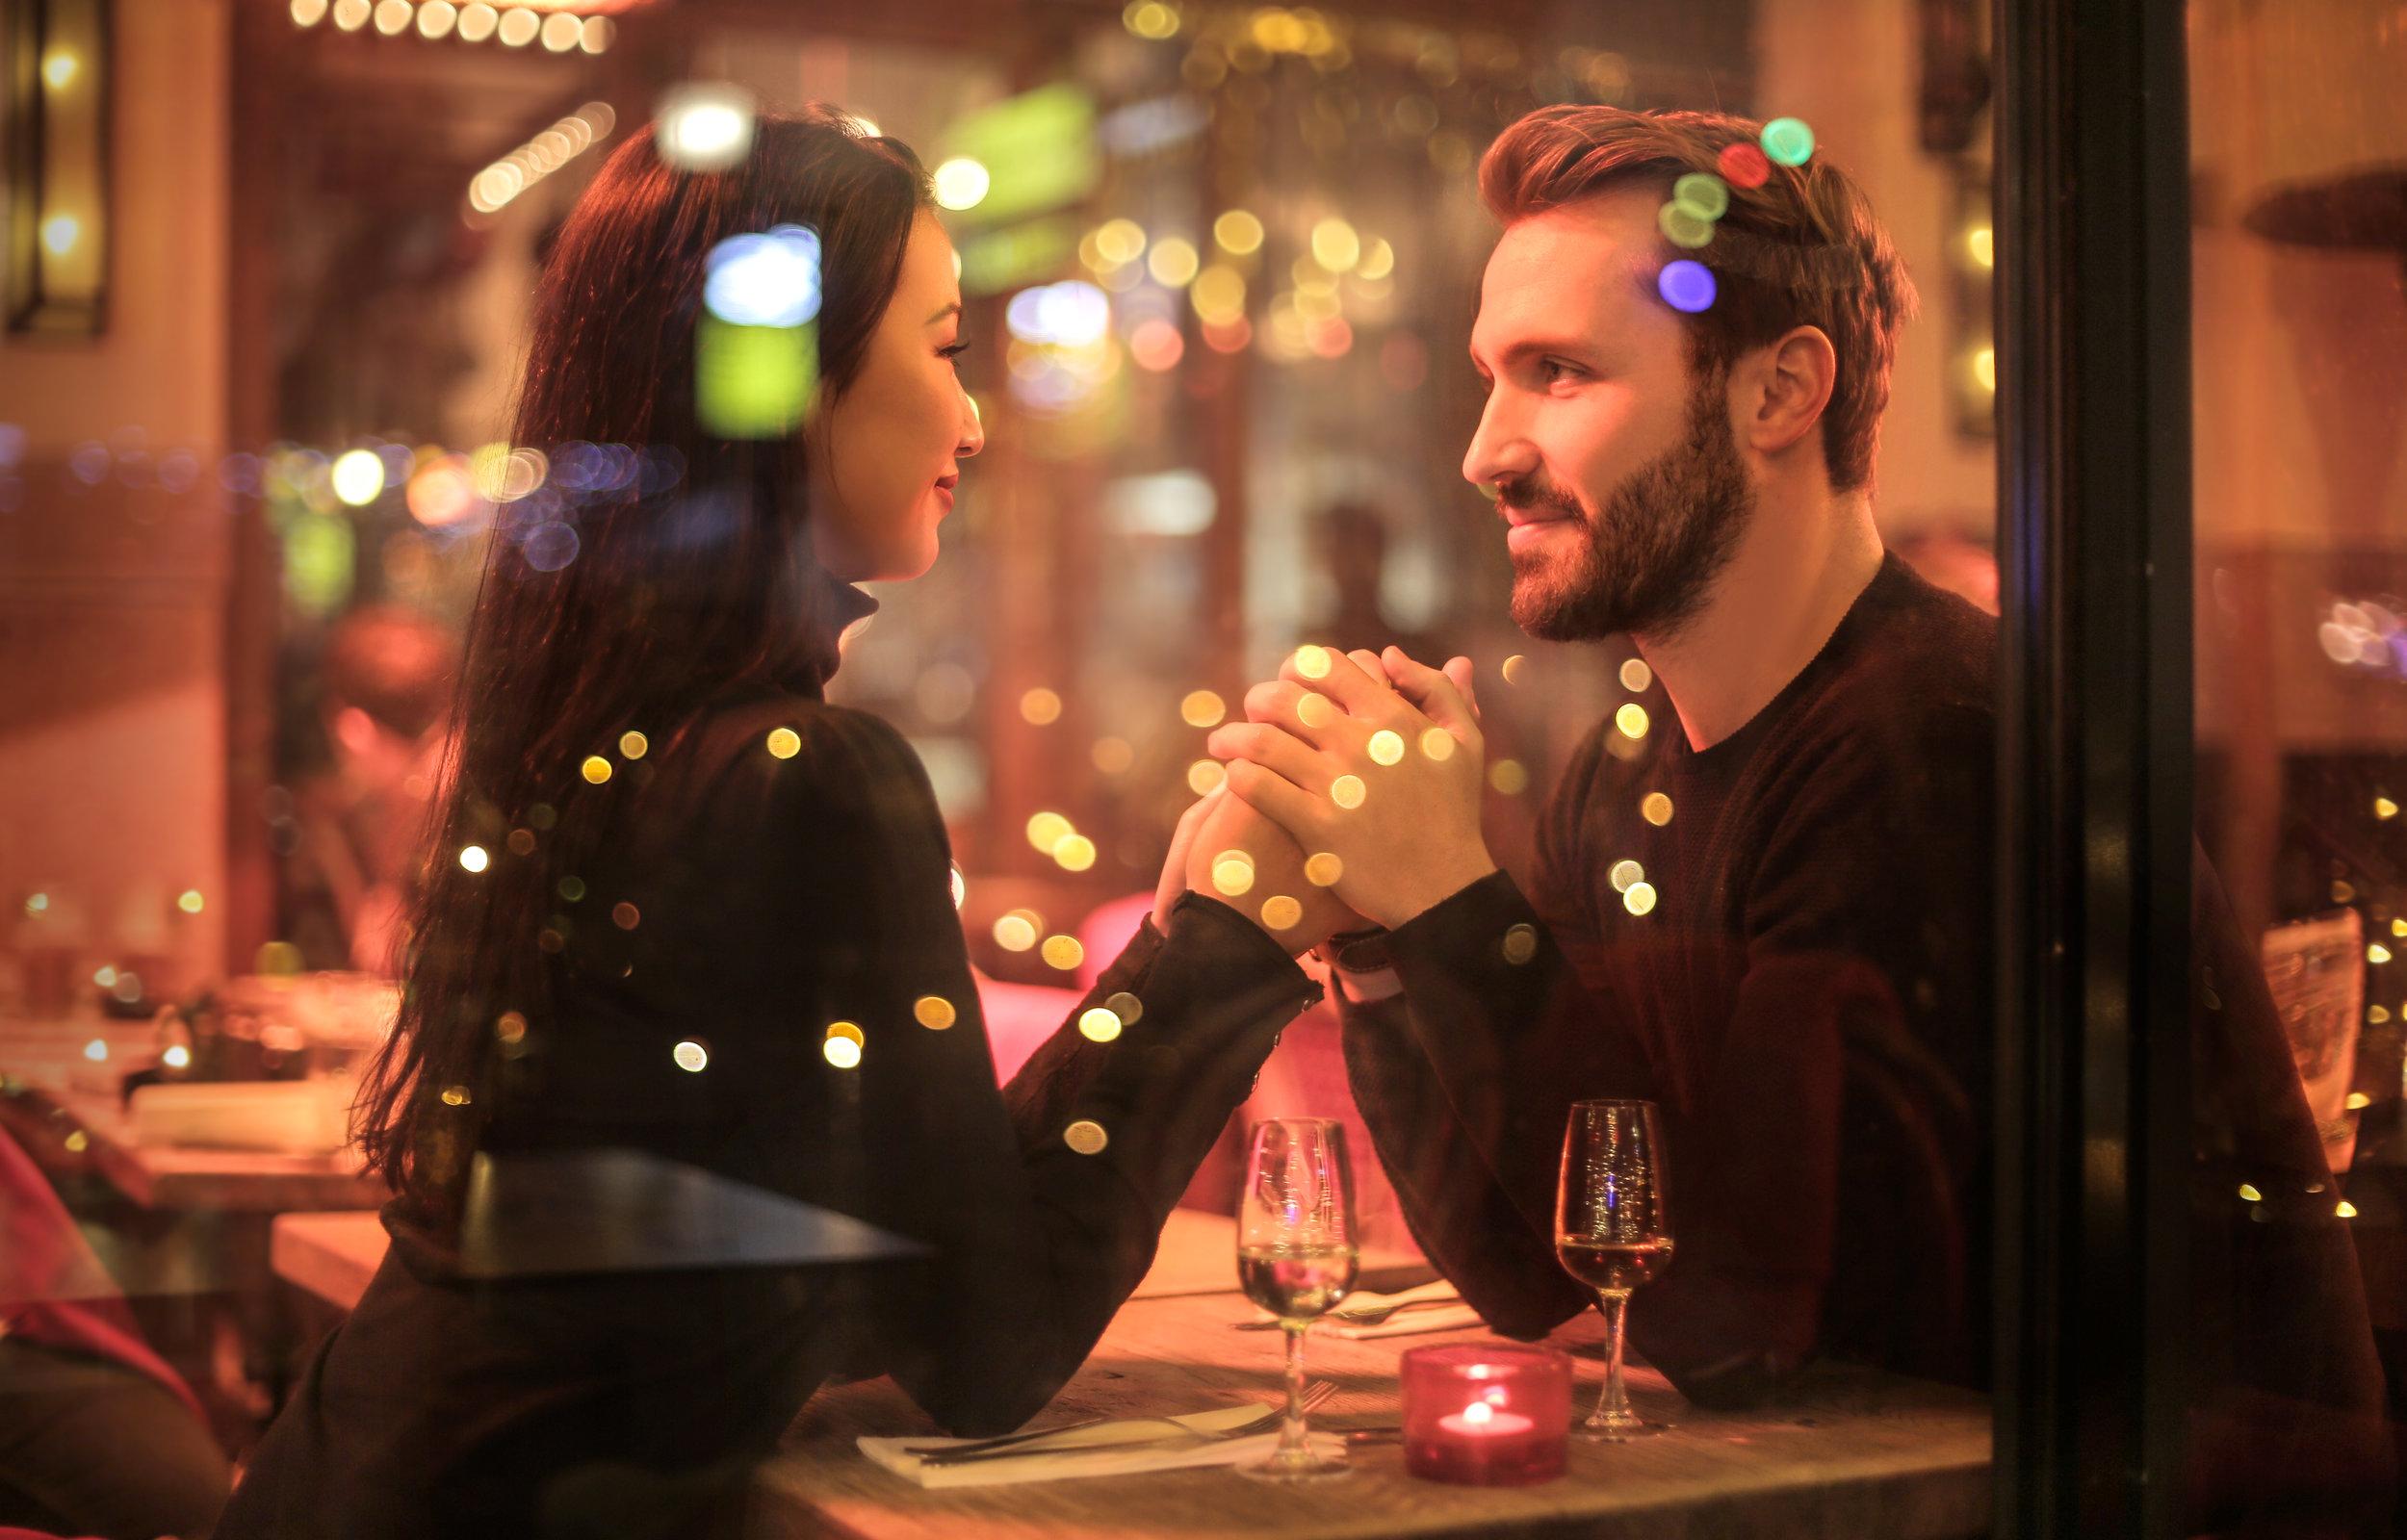 romantic giving:receiving - pexels-photo-842546.jpeg